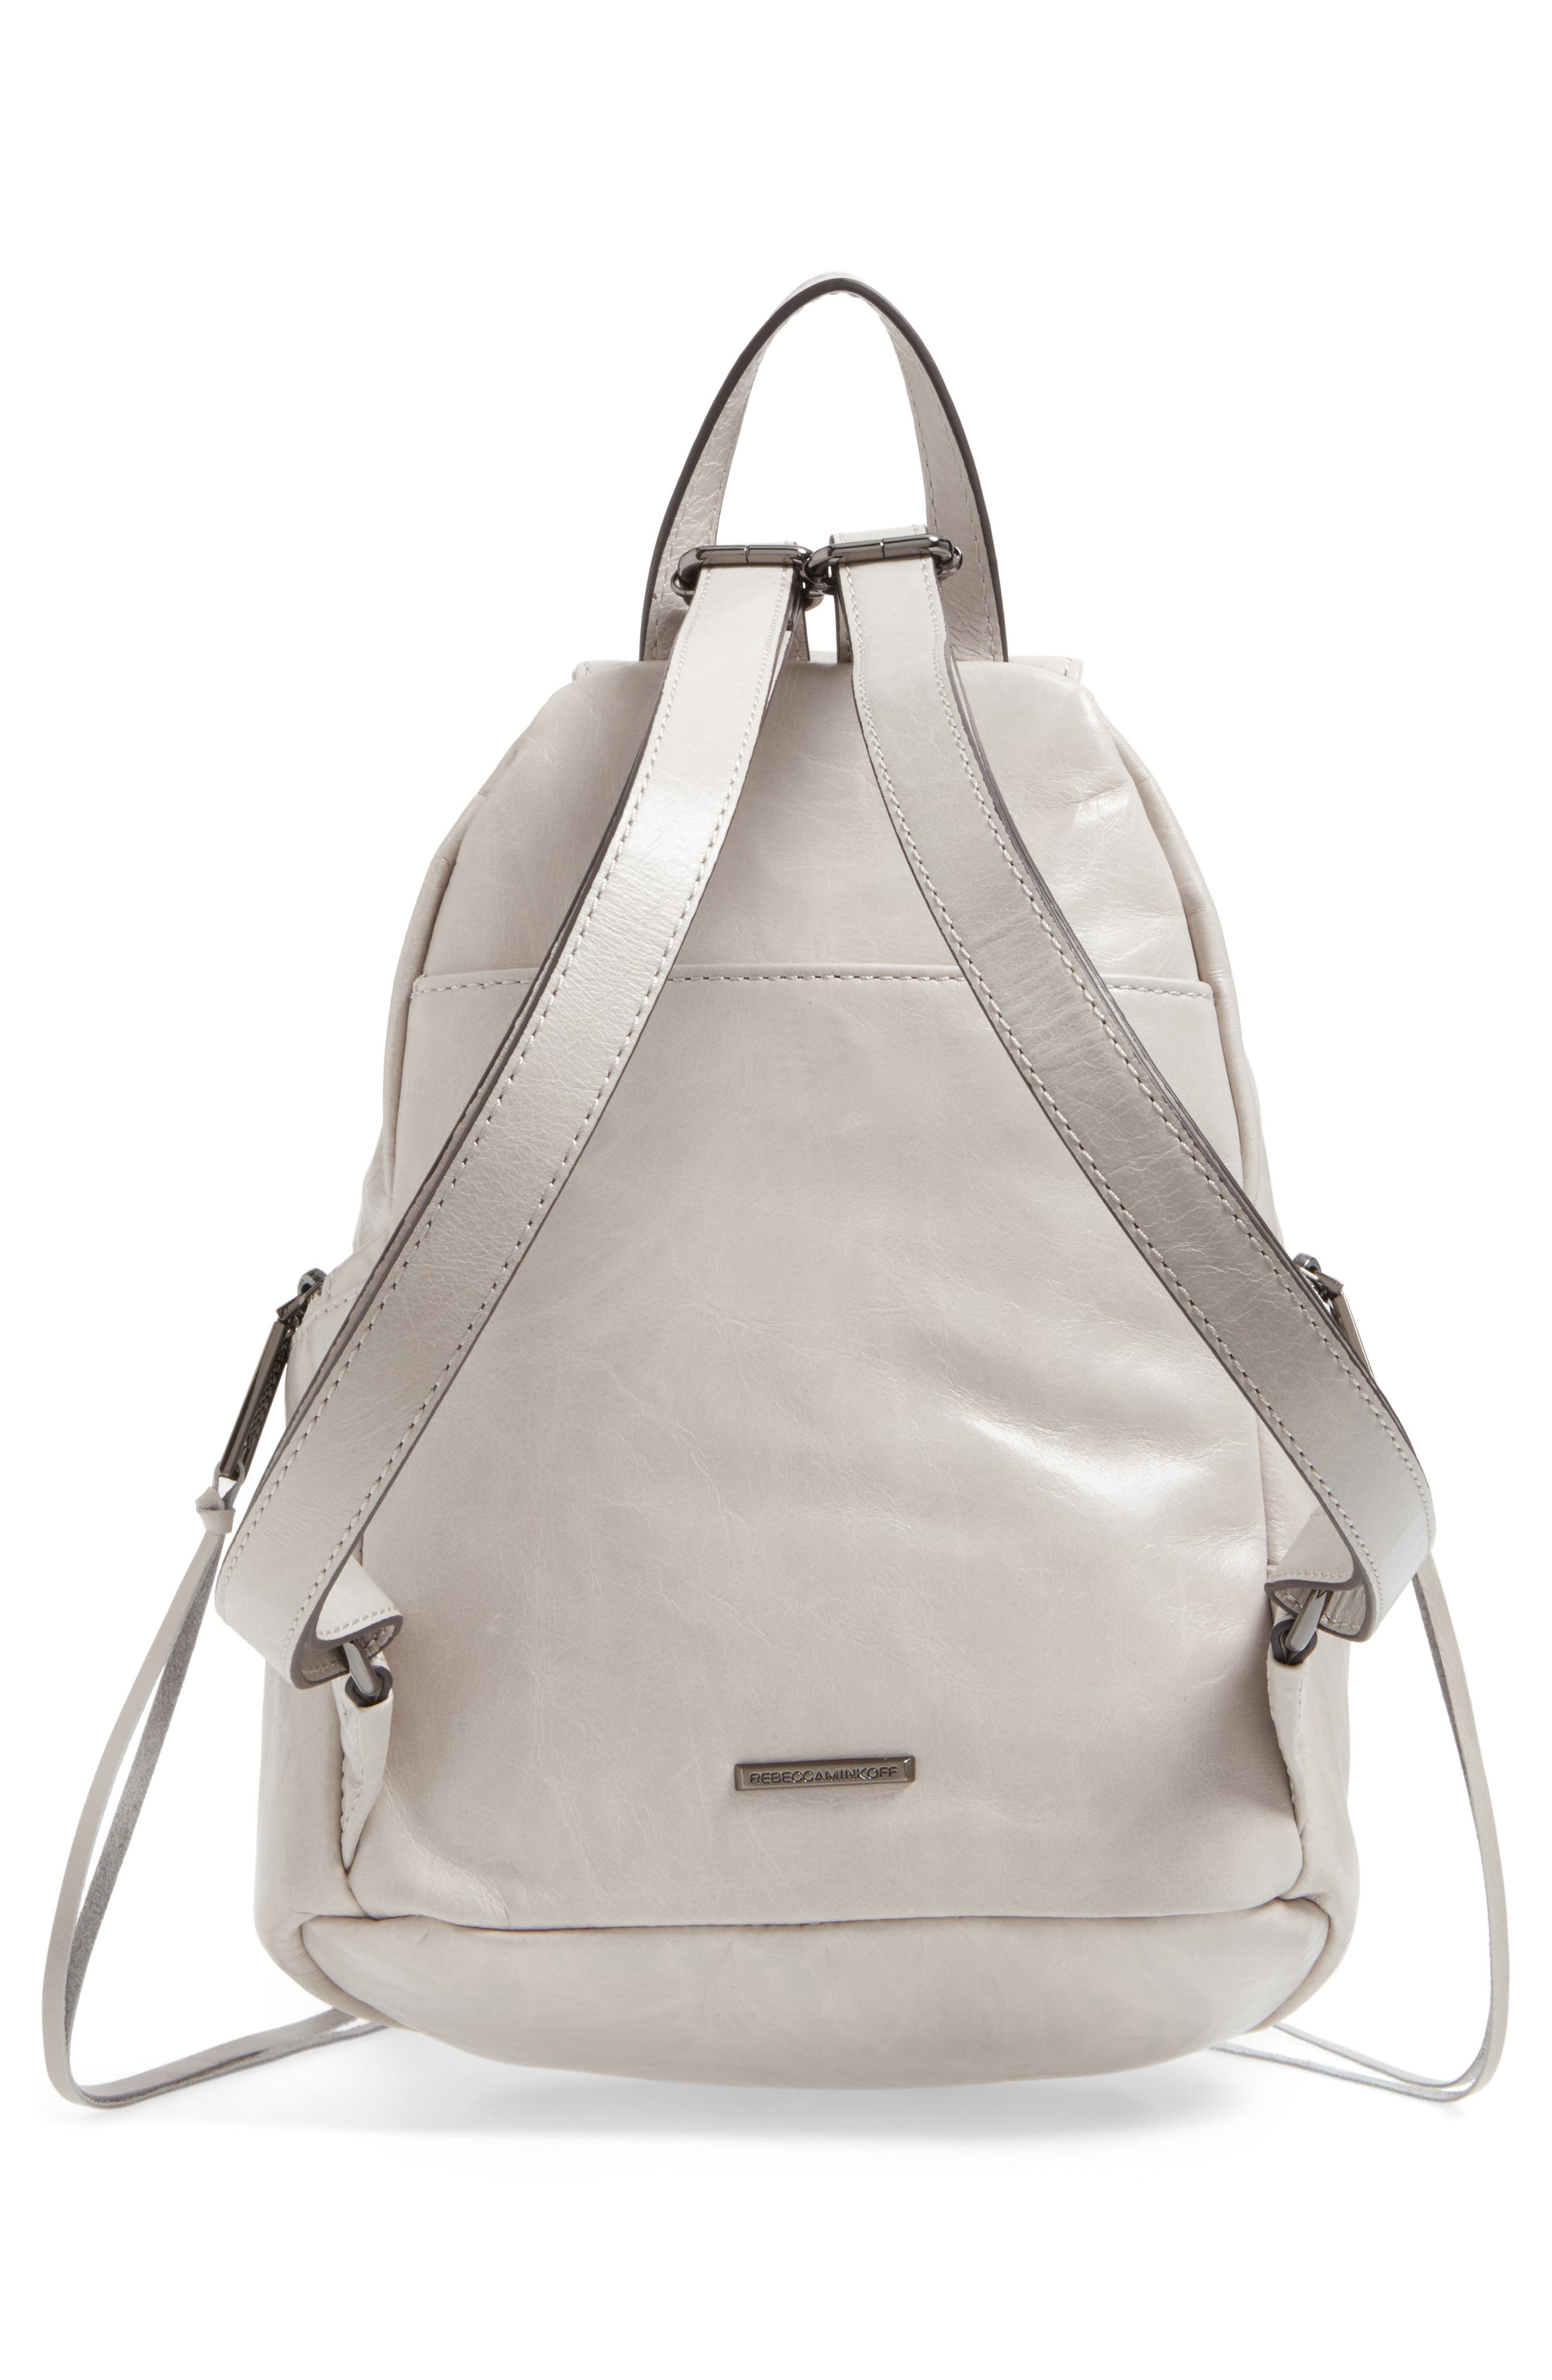 Medium Julian Leather Backpack,                             Alternate thumbnail 11, color,